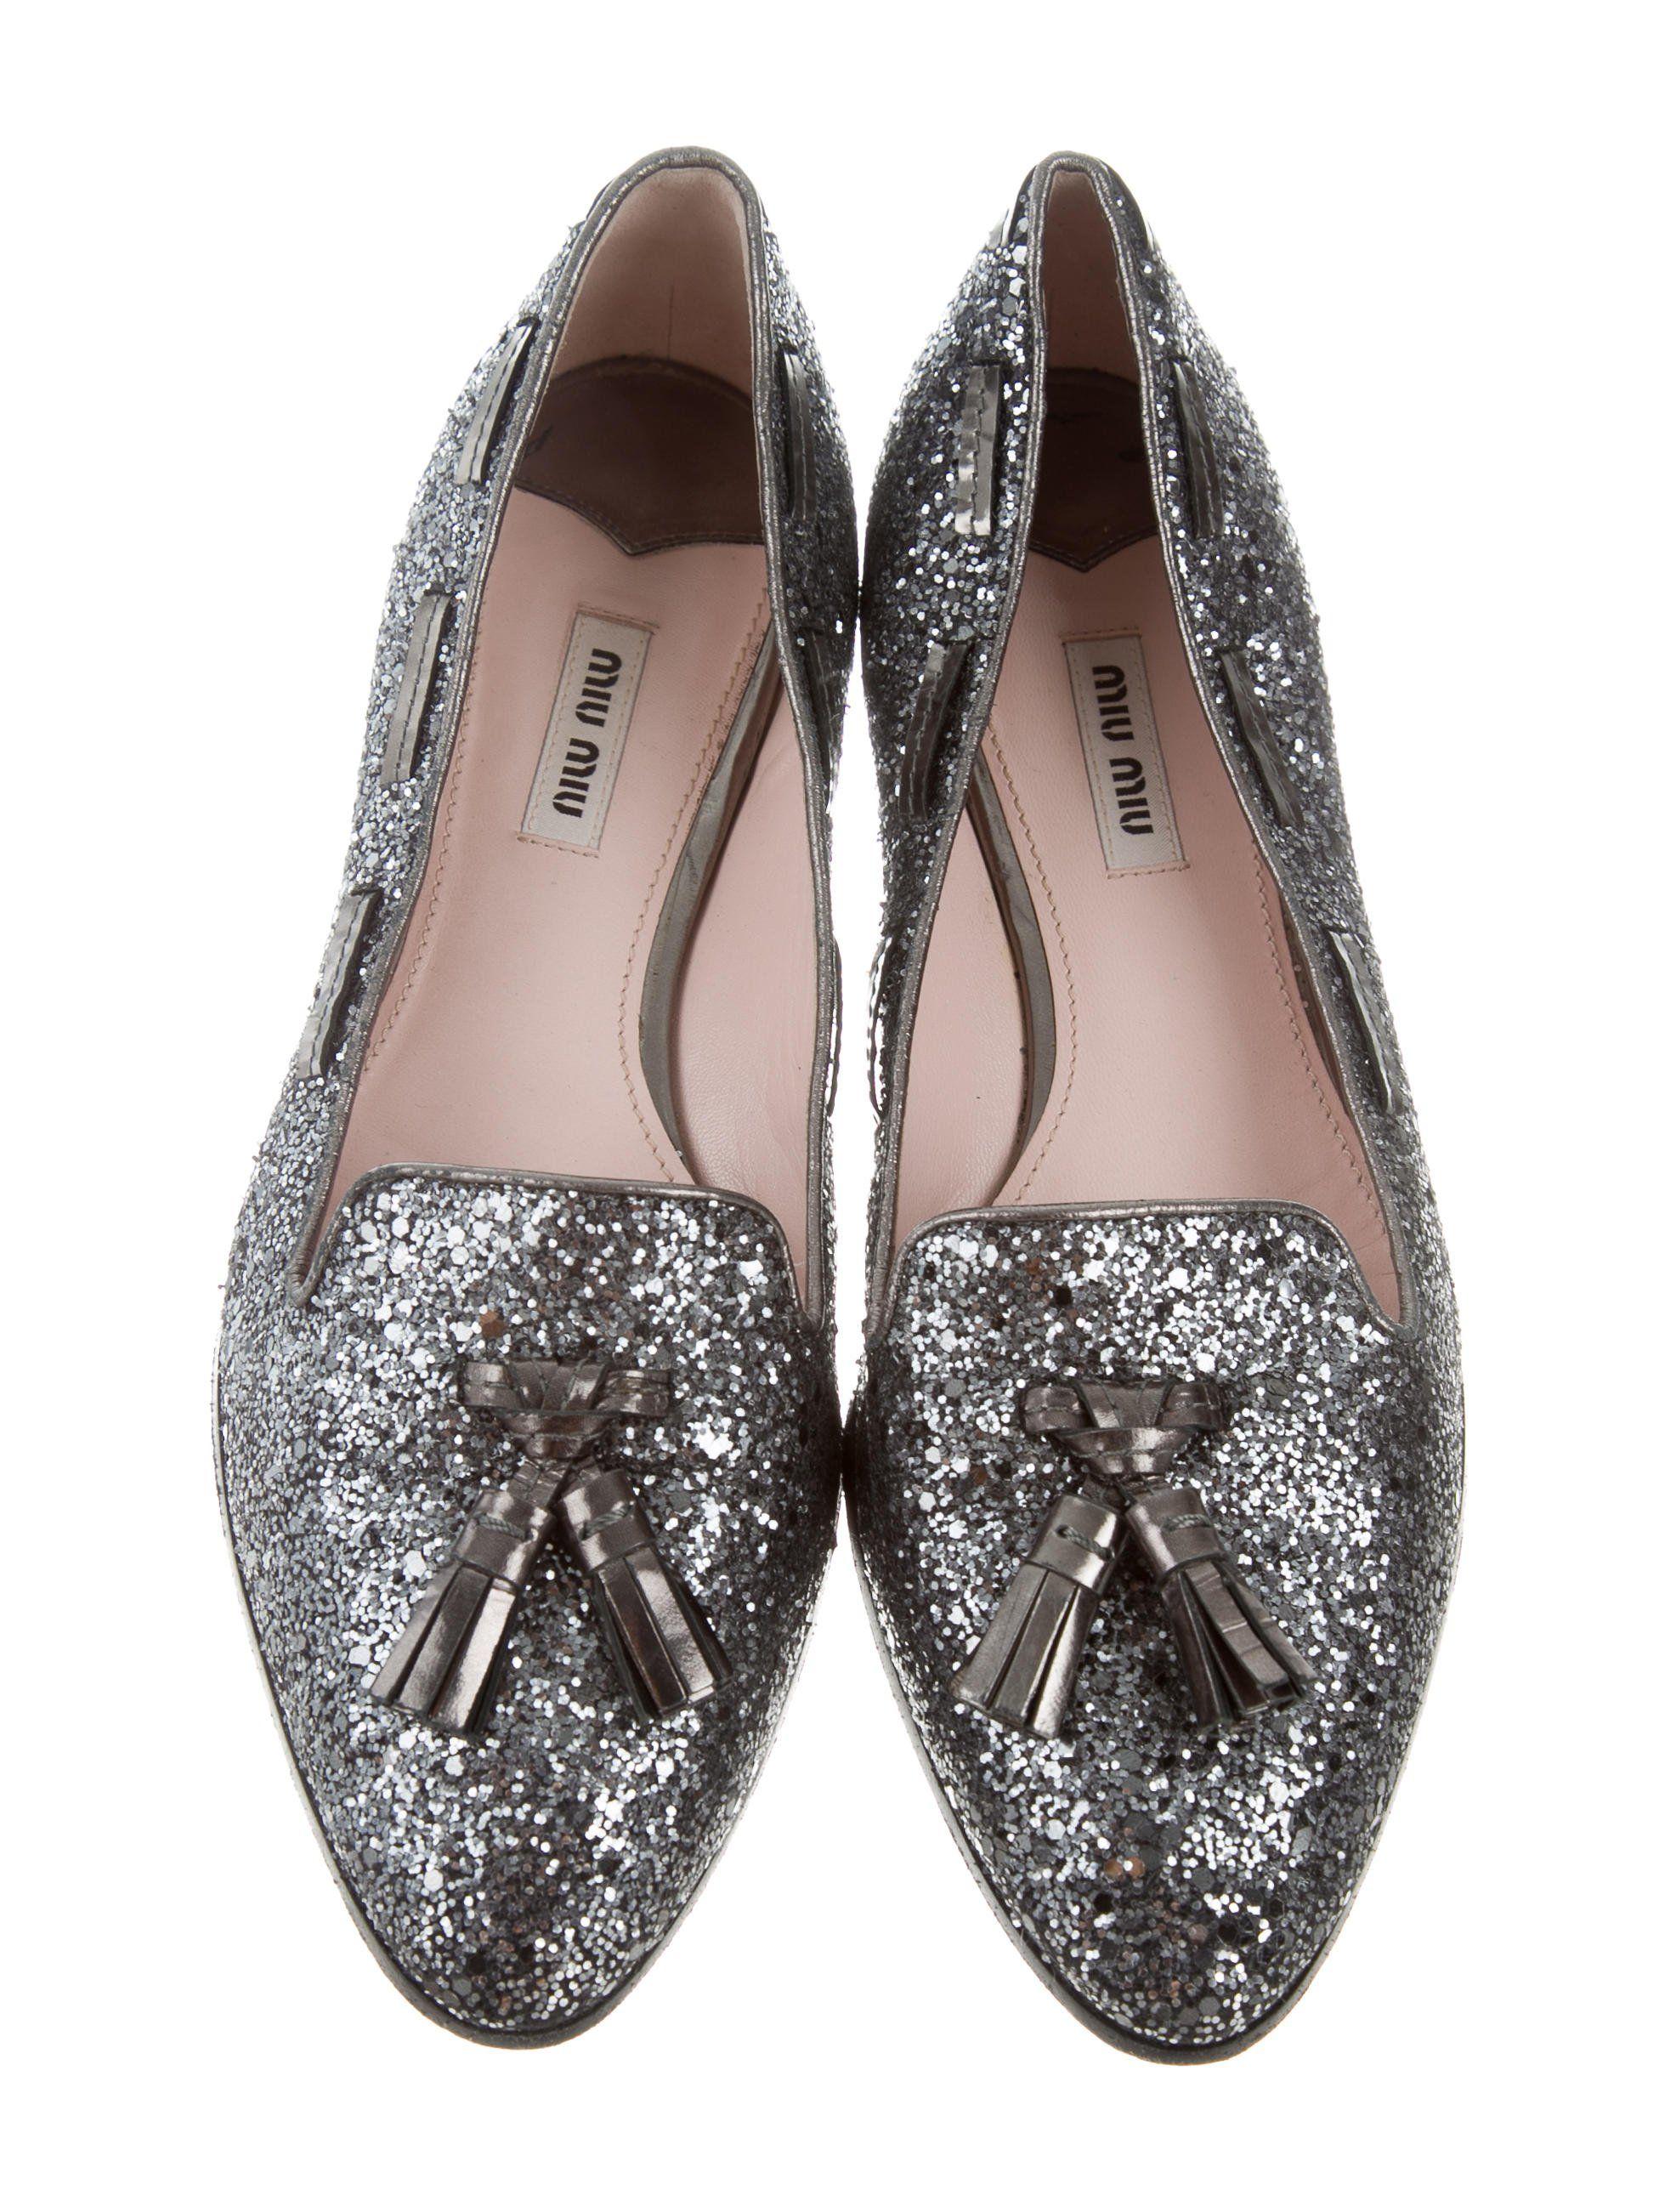 comfortable for sale Miu Miu Glitter Semi Pointed-Toe Flats really online e2FOoD8Yk